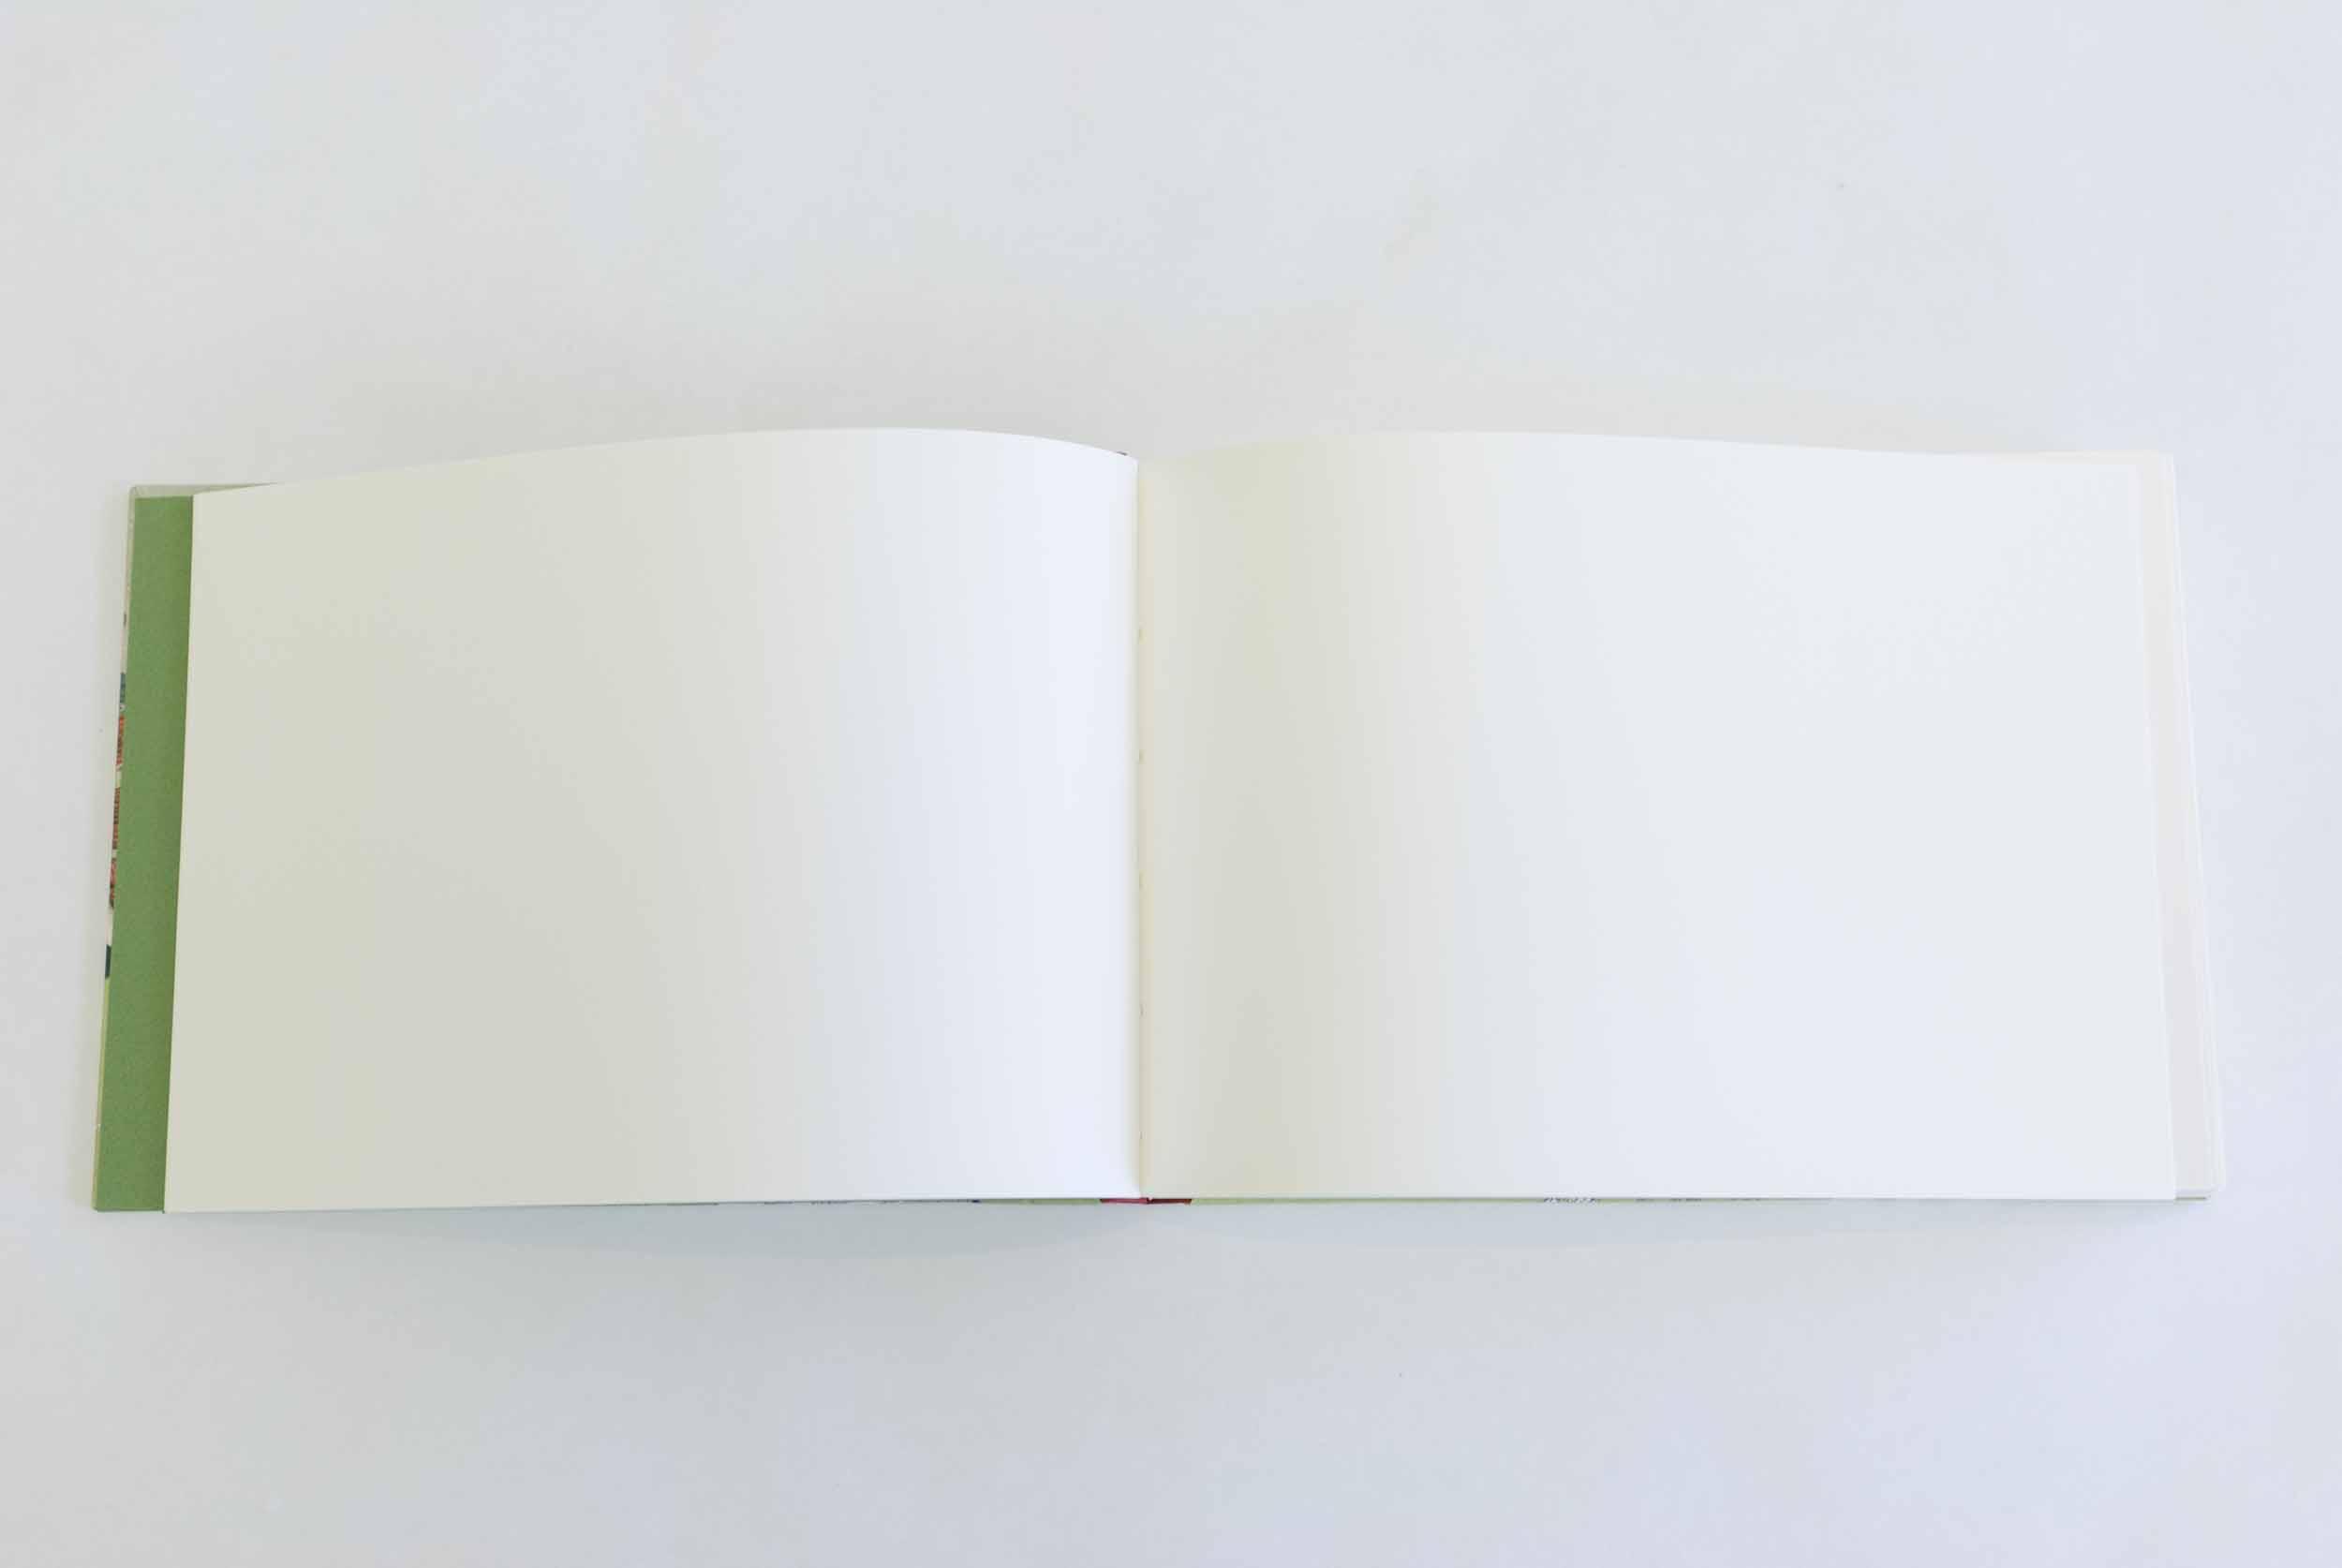 Sketchbook format, design 1 (Chinese lion), interior pages